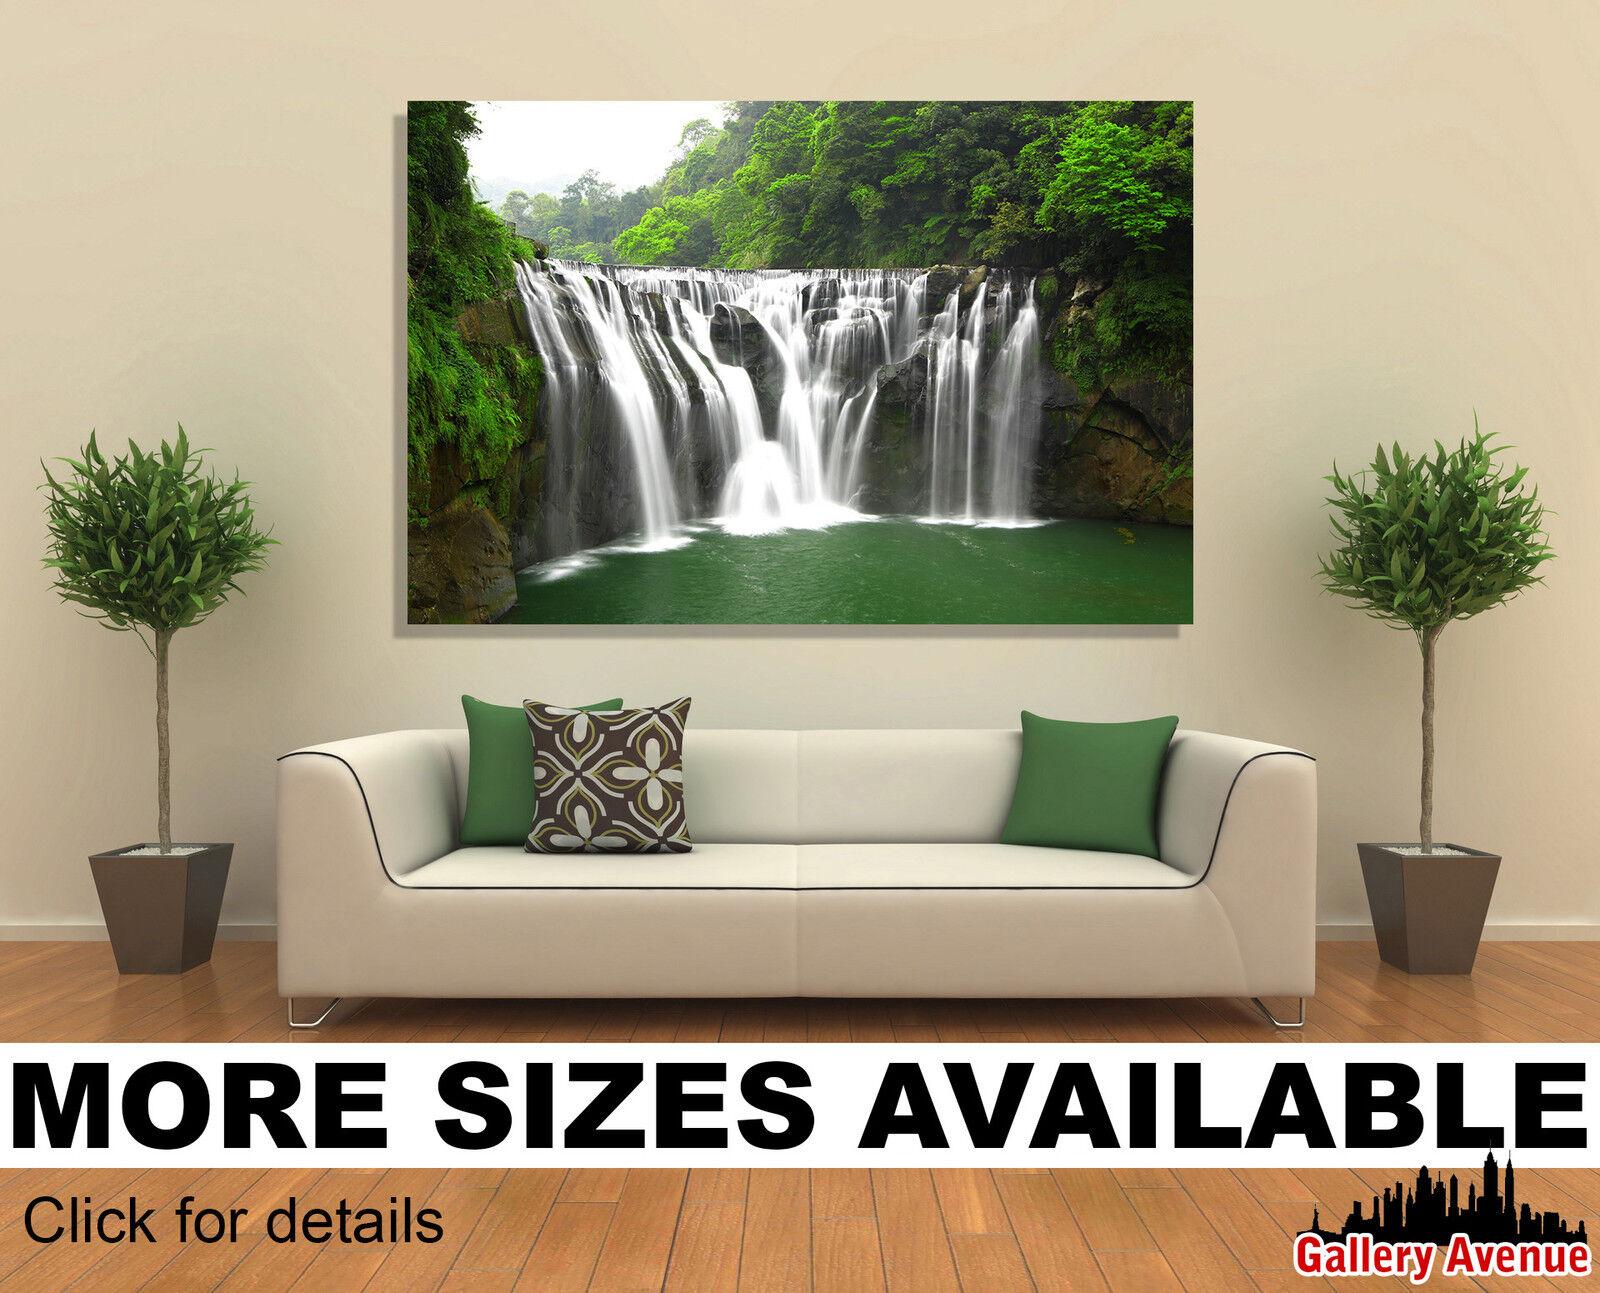 Wall Art Canvas Picture Print - Waterfalls in Shifen Taiwan 3.2